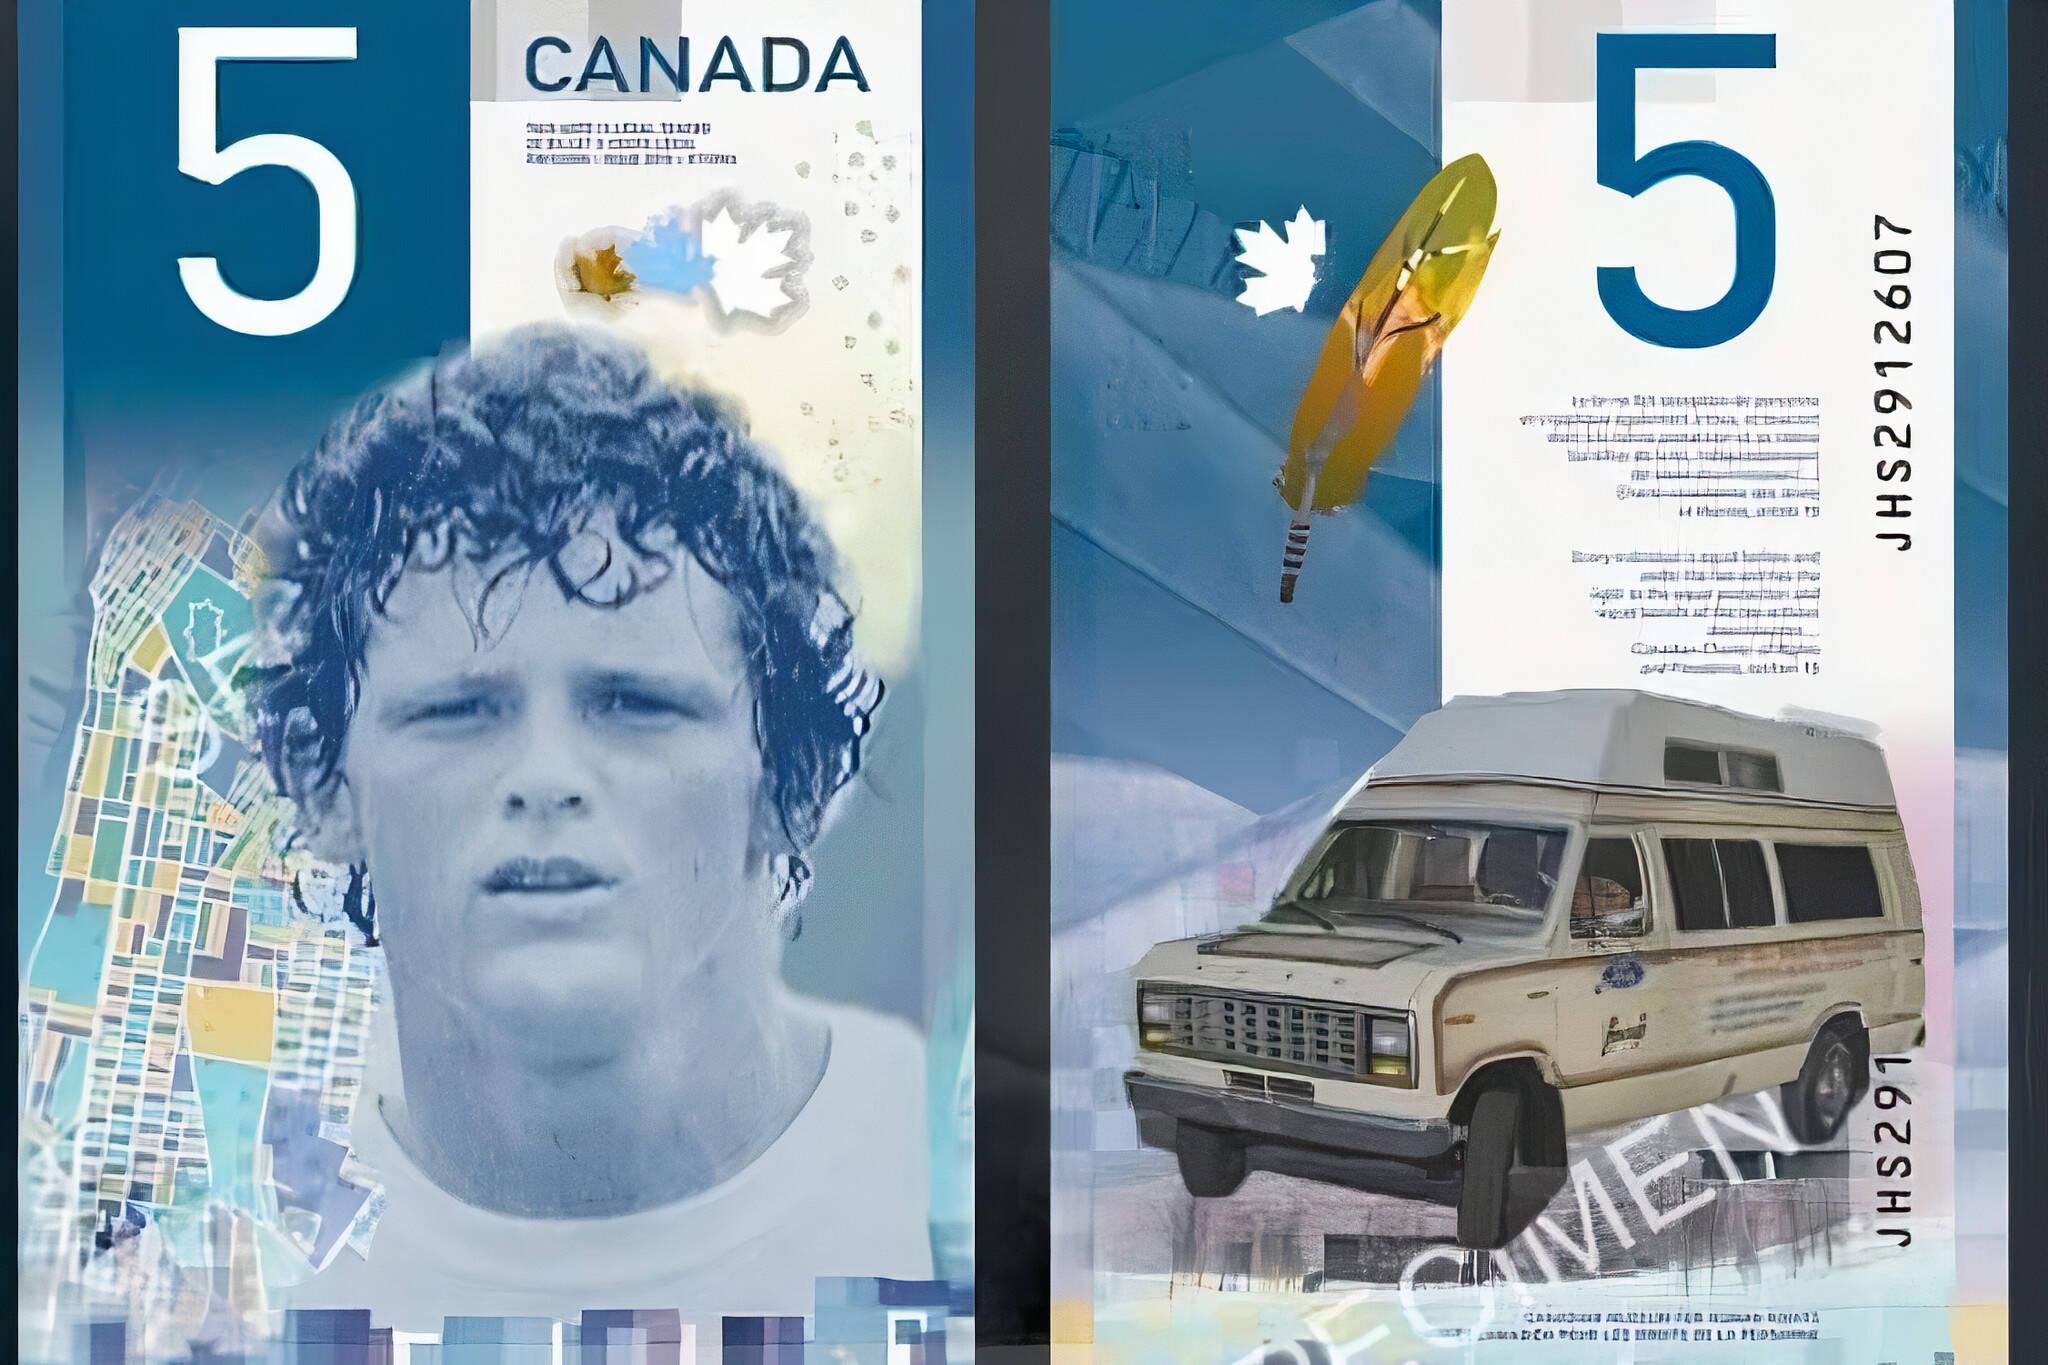 new 5 dollar bill canada